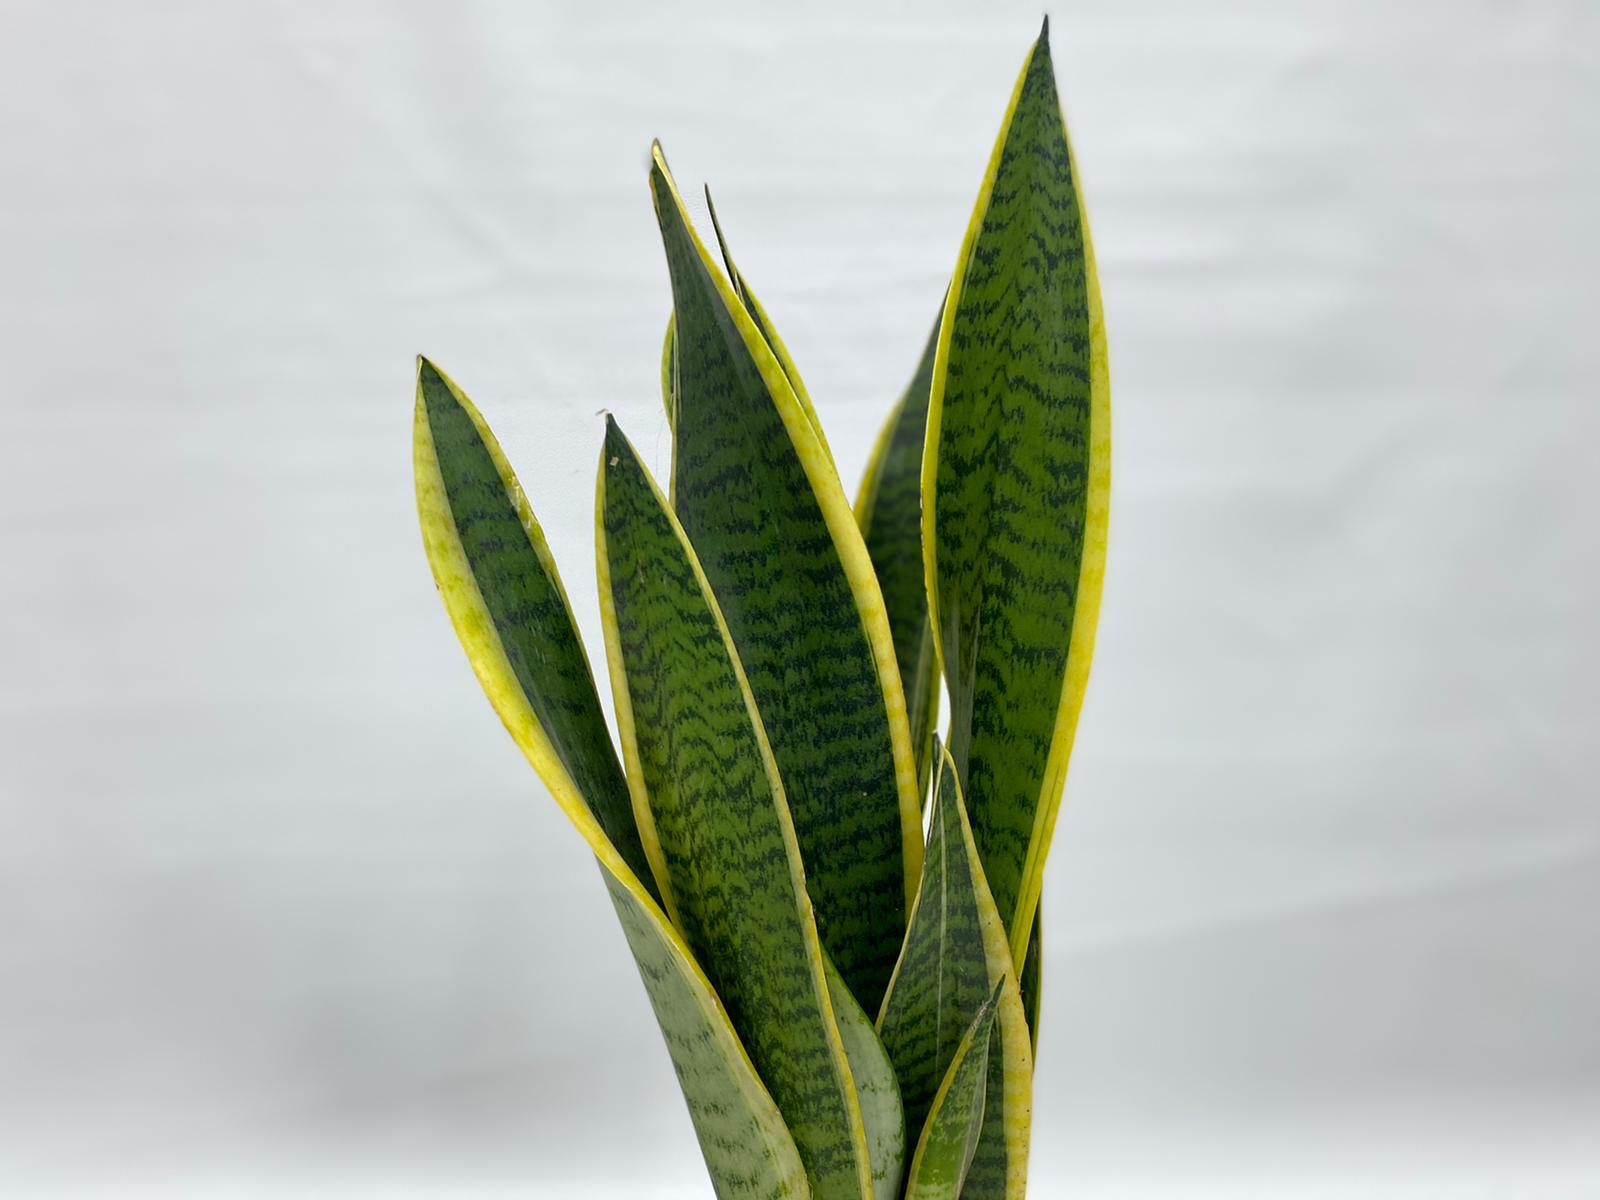 sansevieria laurentii Indoor Plants Shrubs